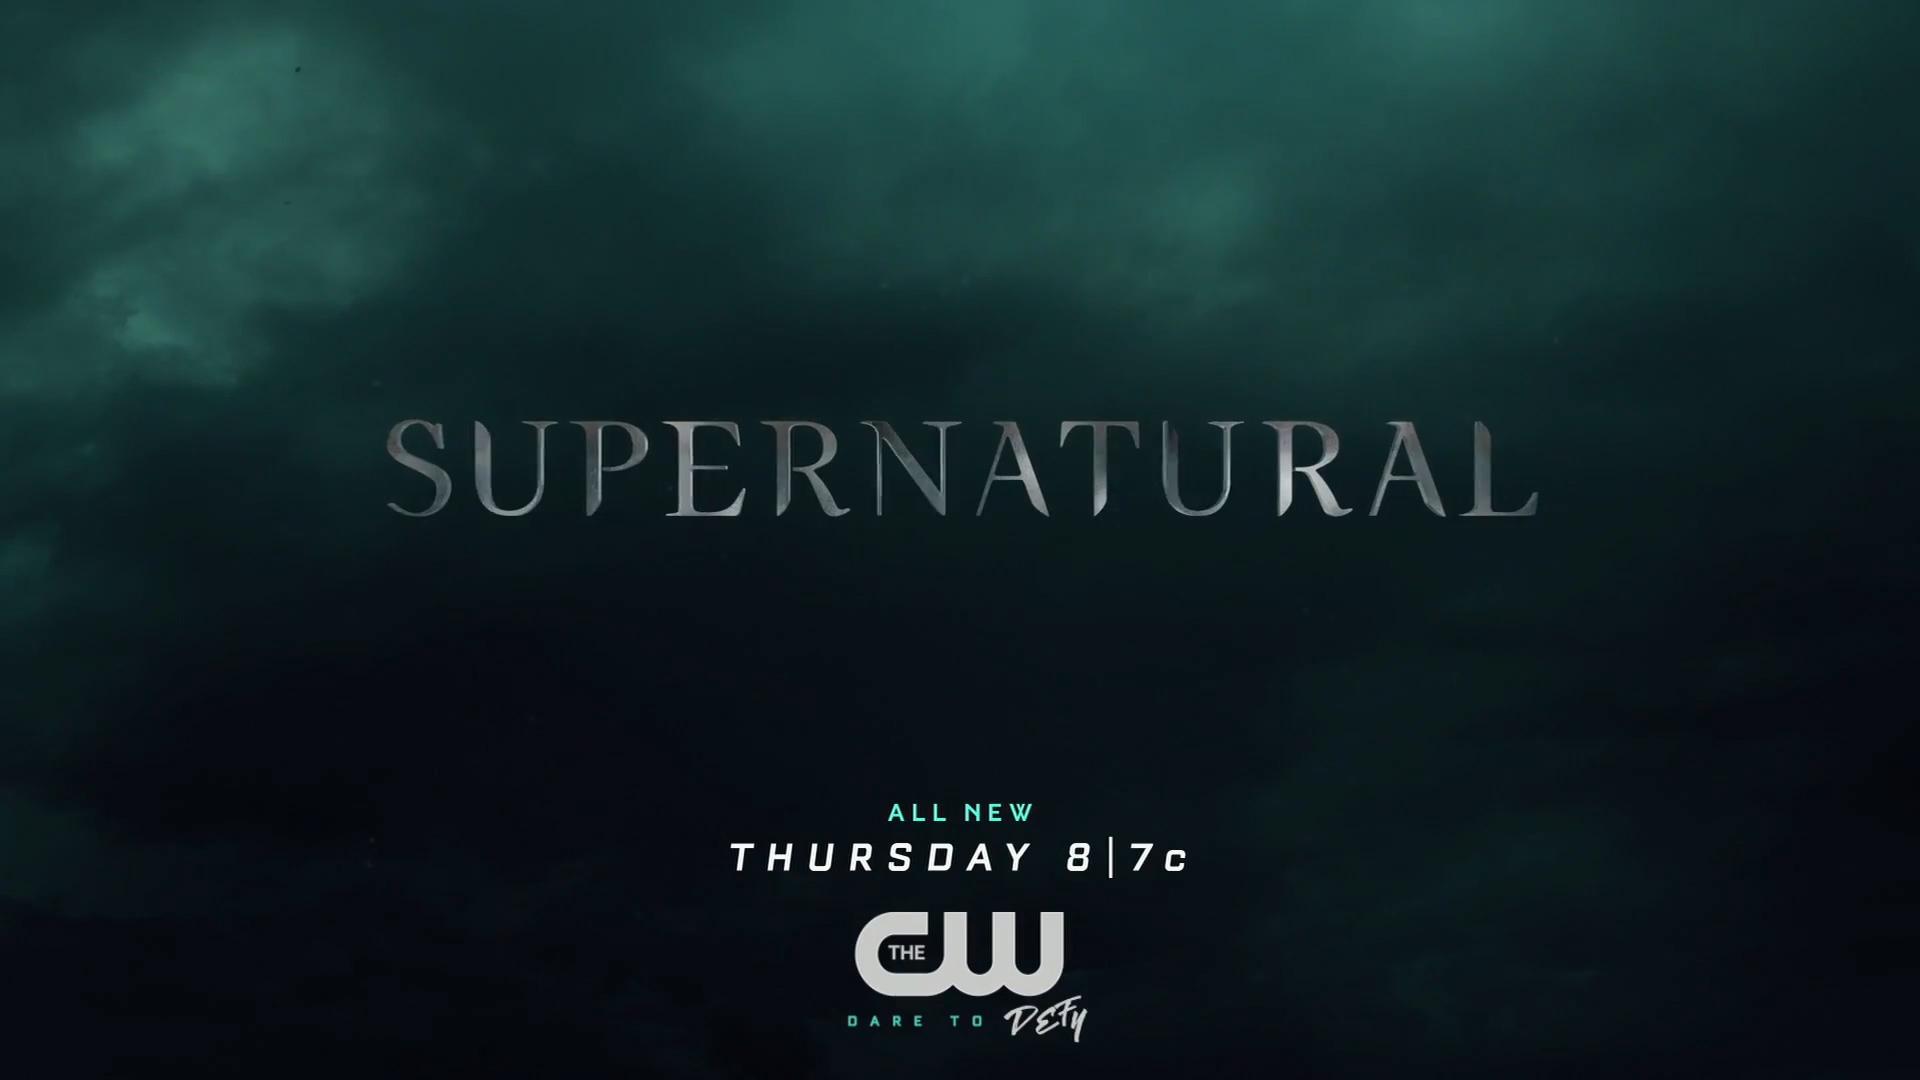 Supernatural S12